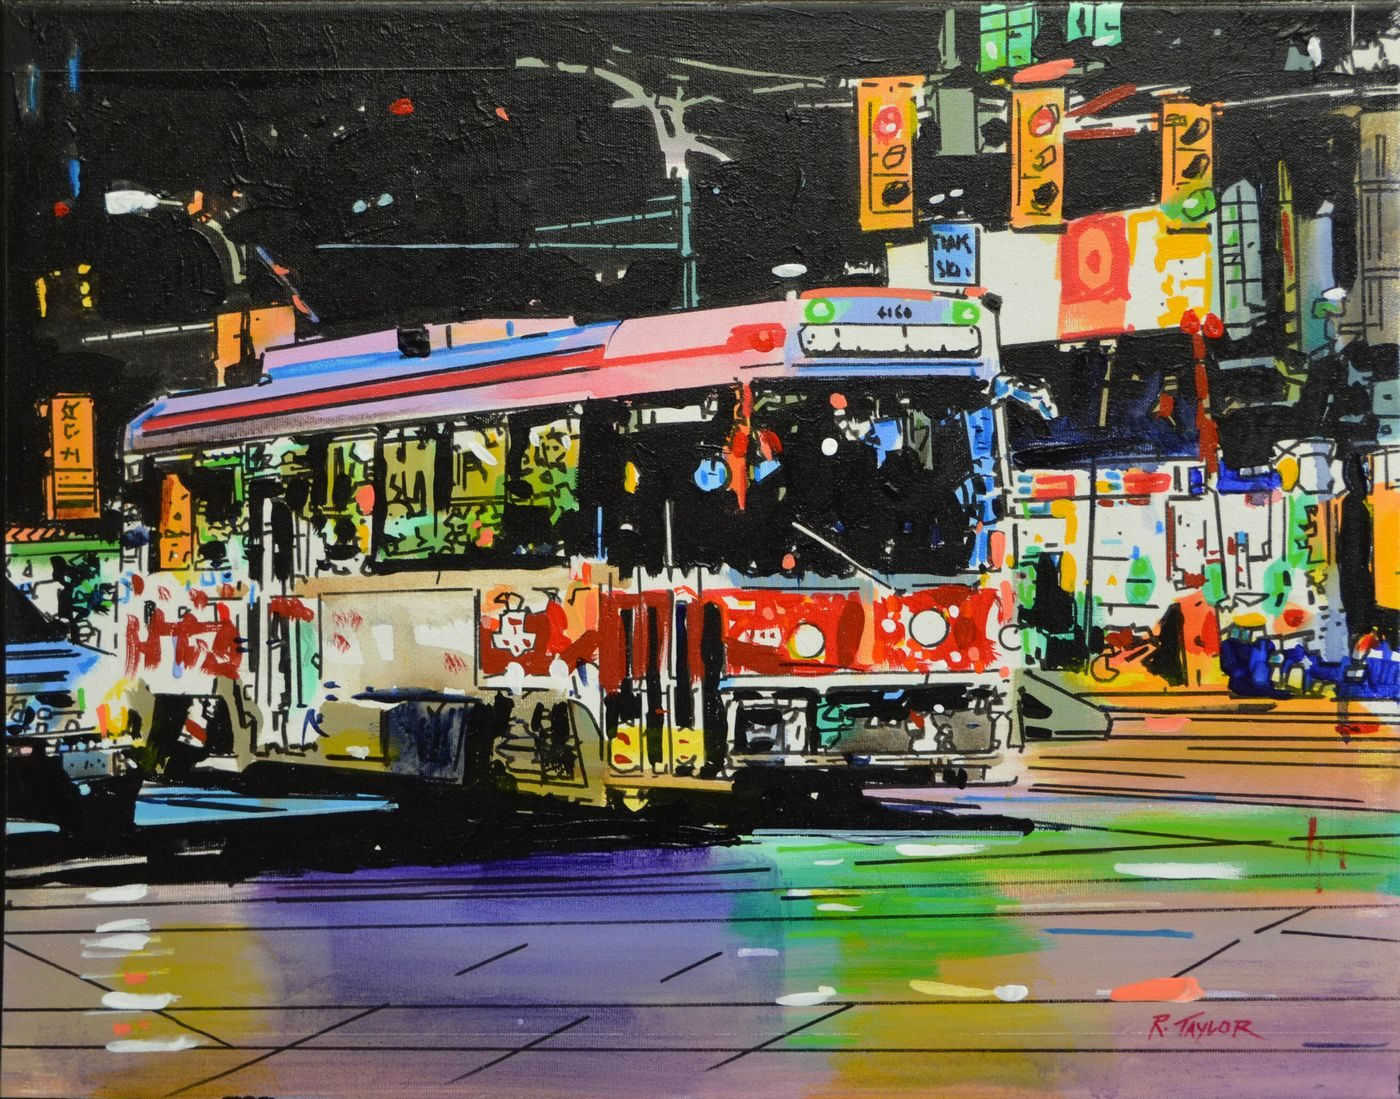 Rick Taylor - Light Rail